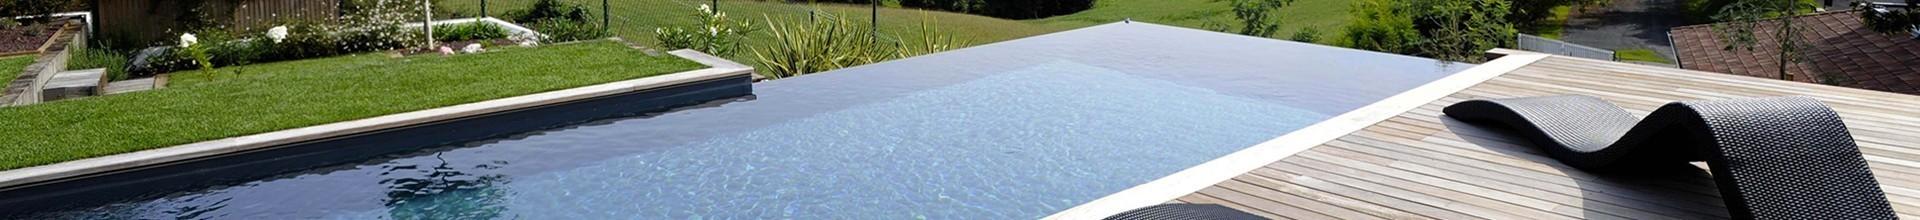 Direct usine, piscine coque prix Val-de-Marne